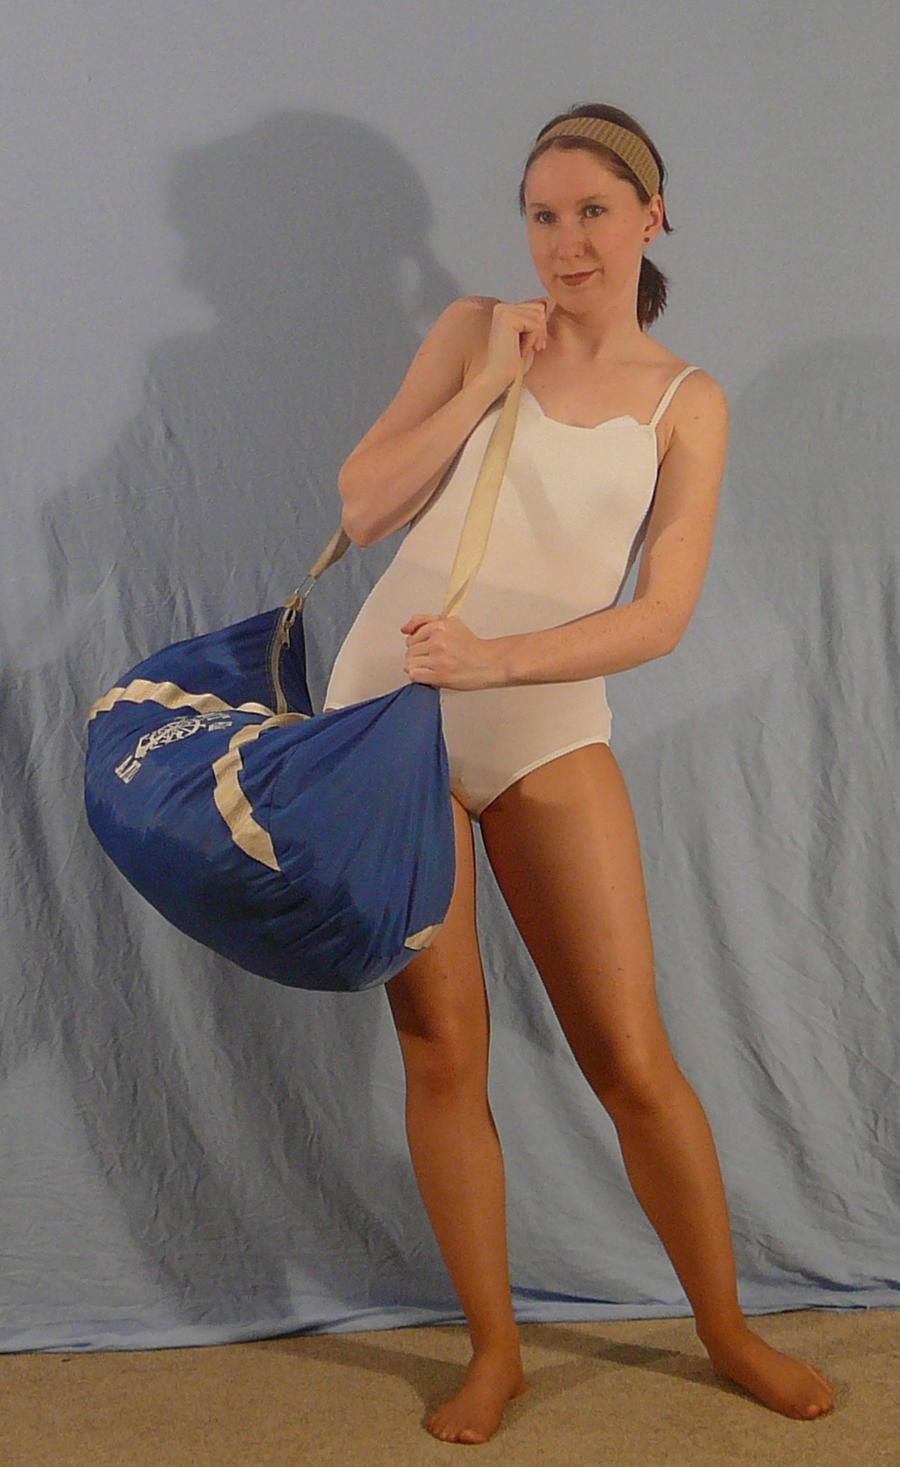 Sailor Leaving 2 by SenshiStock